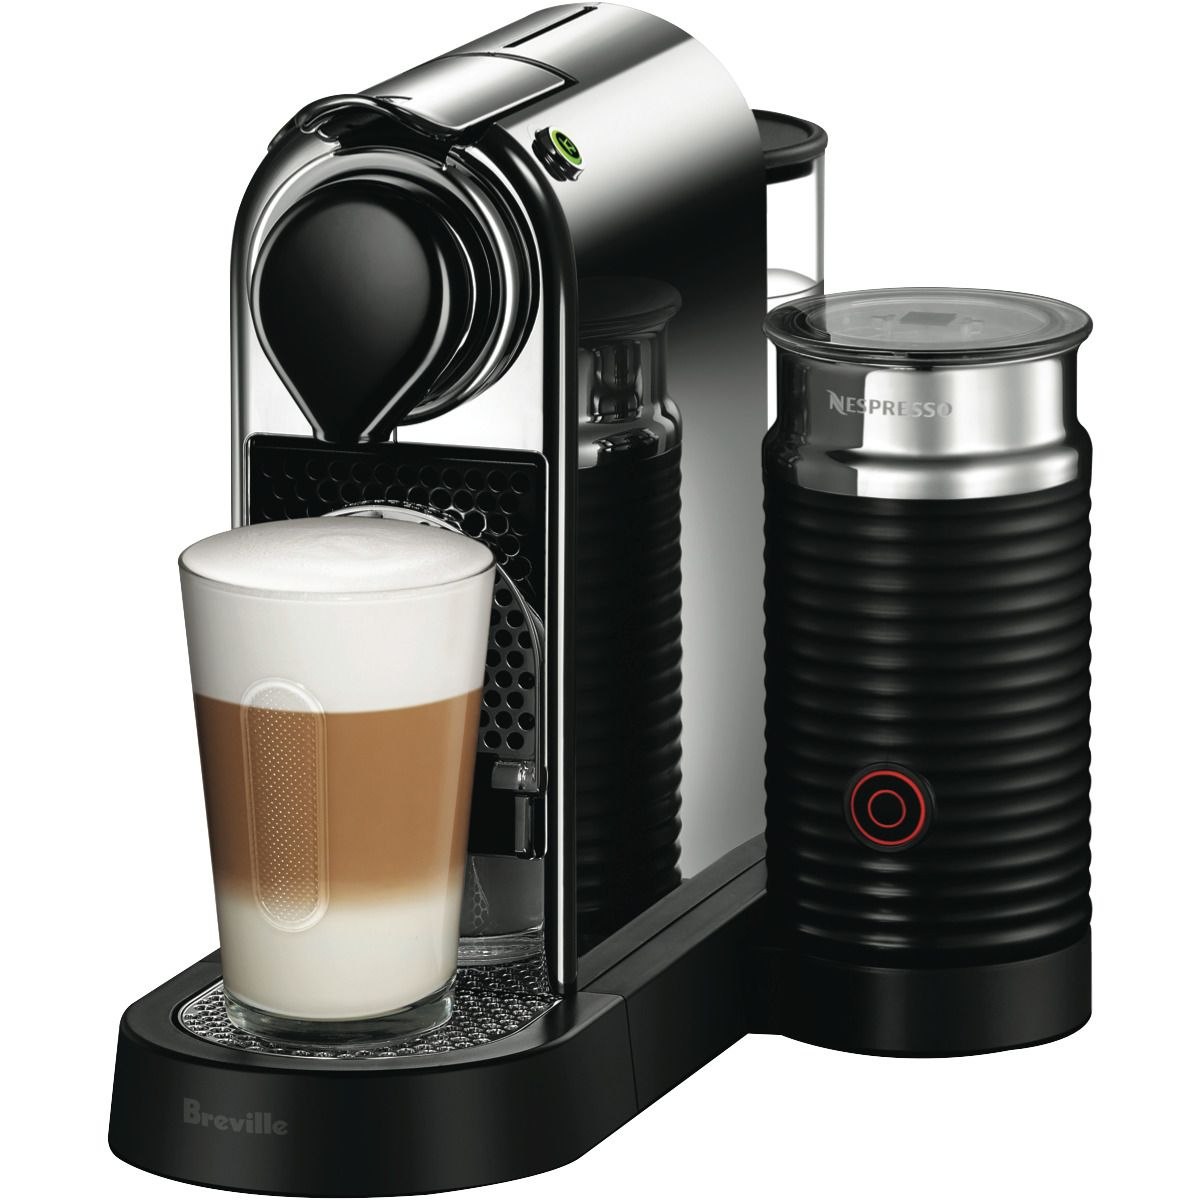 Image result for nespresso pods machine Nespresso